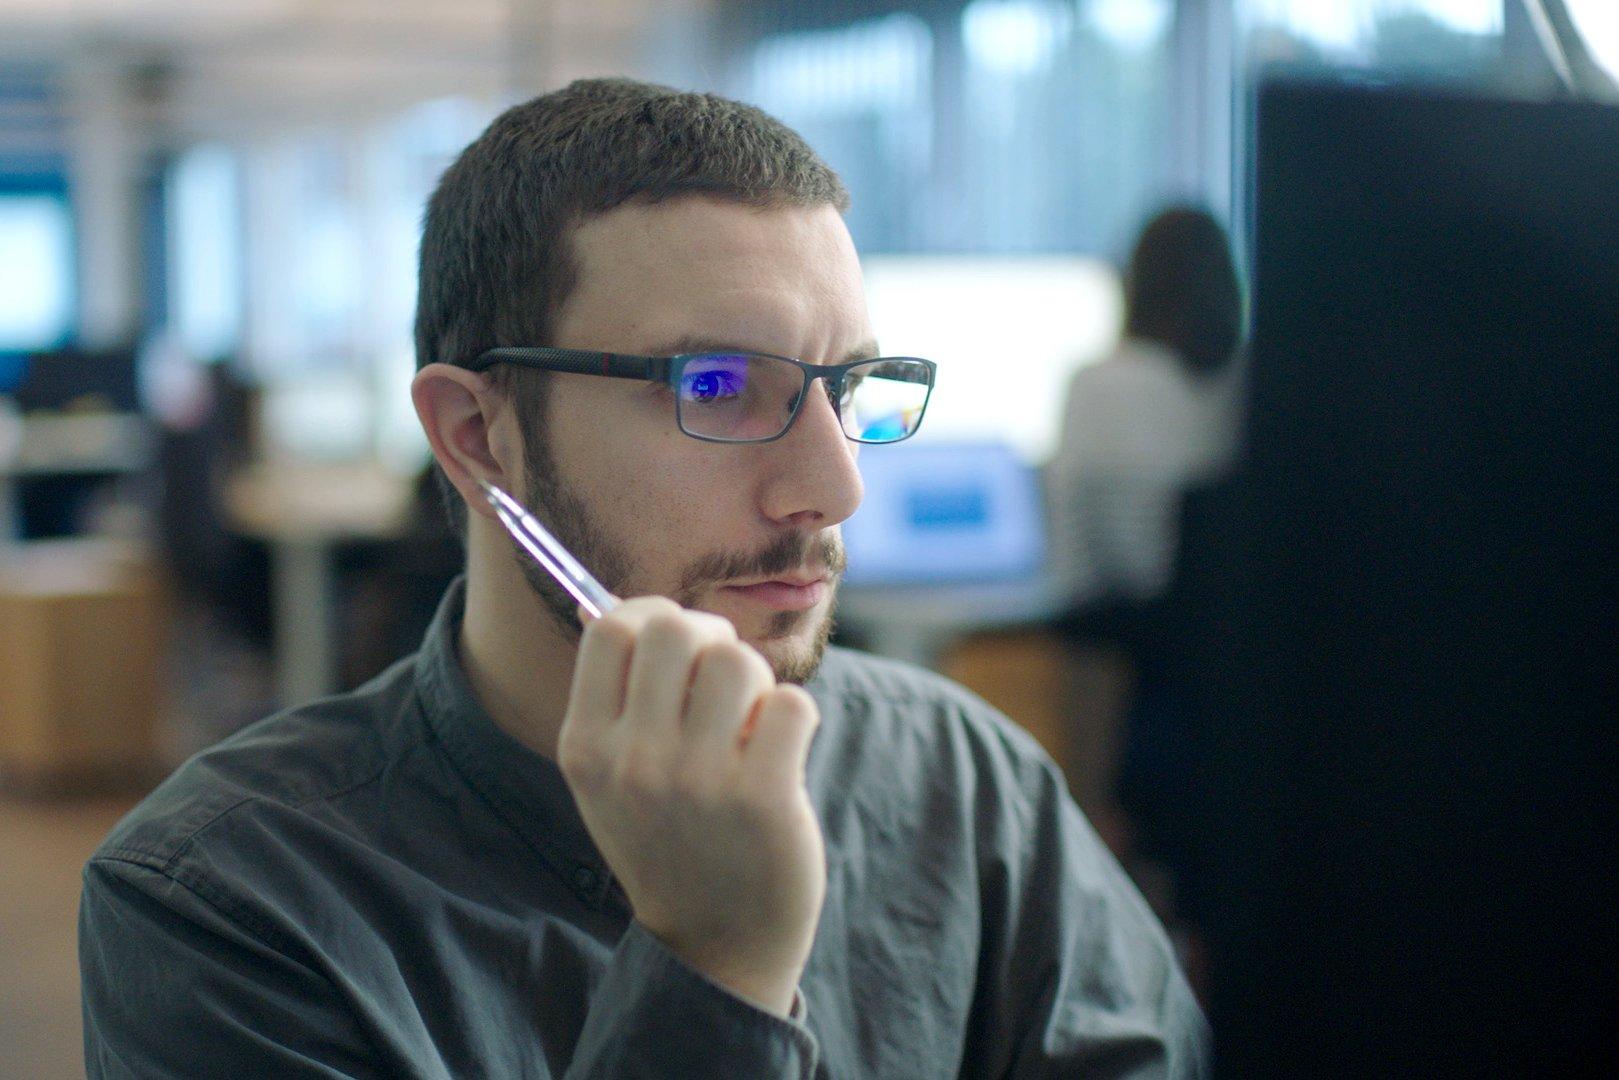 Administrator looking at his computer